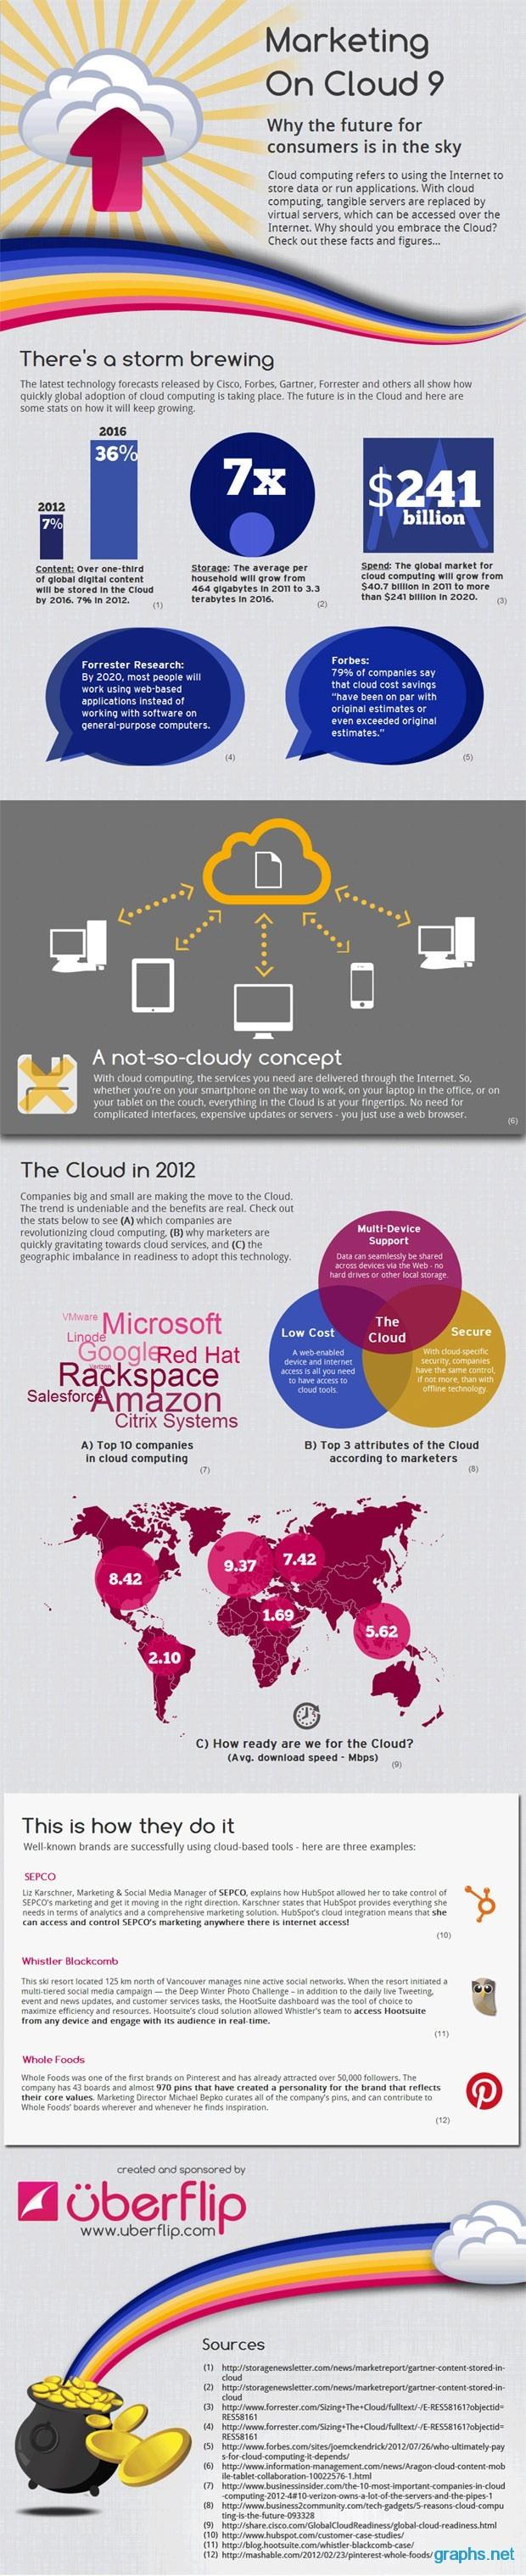 Cloud Computing Marketing